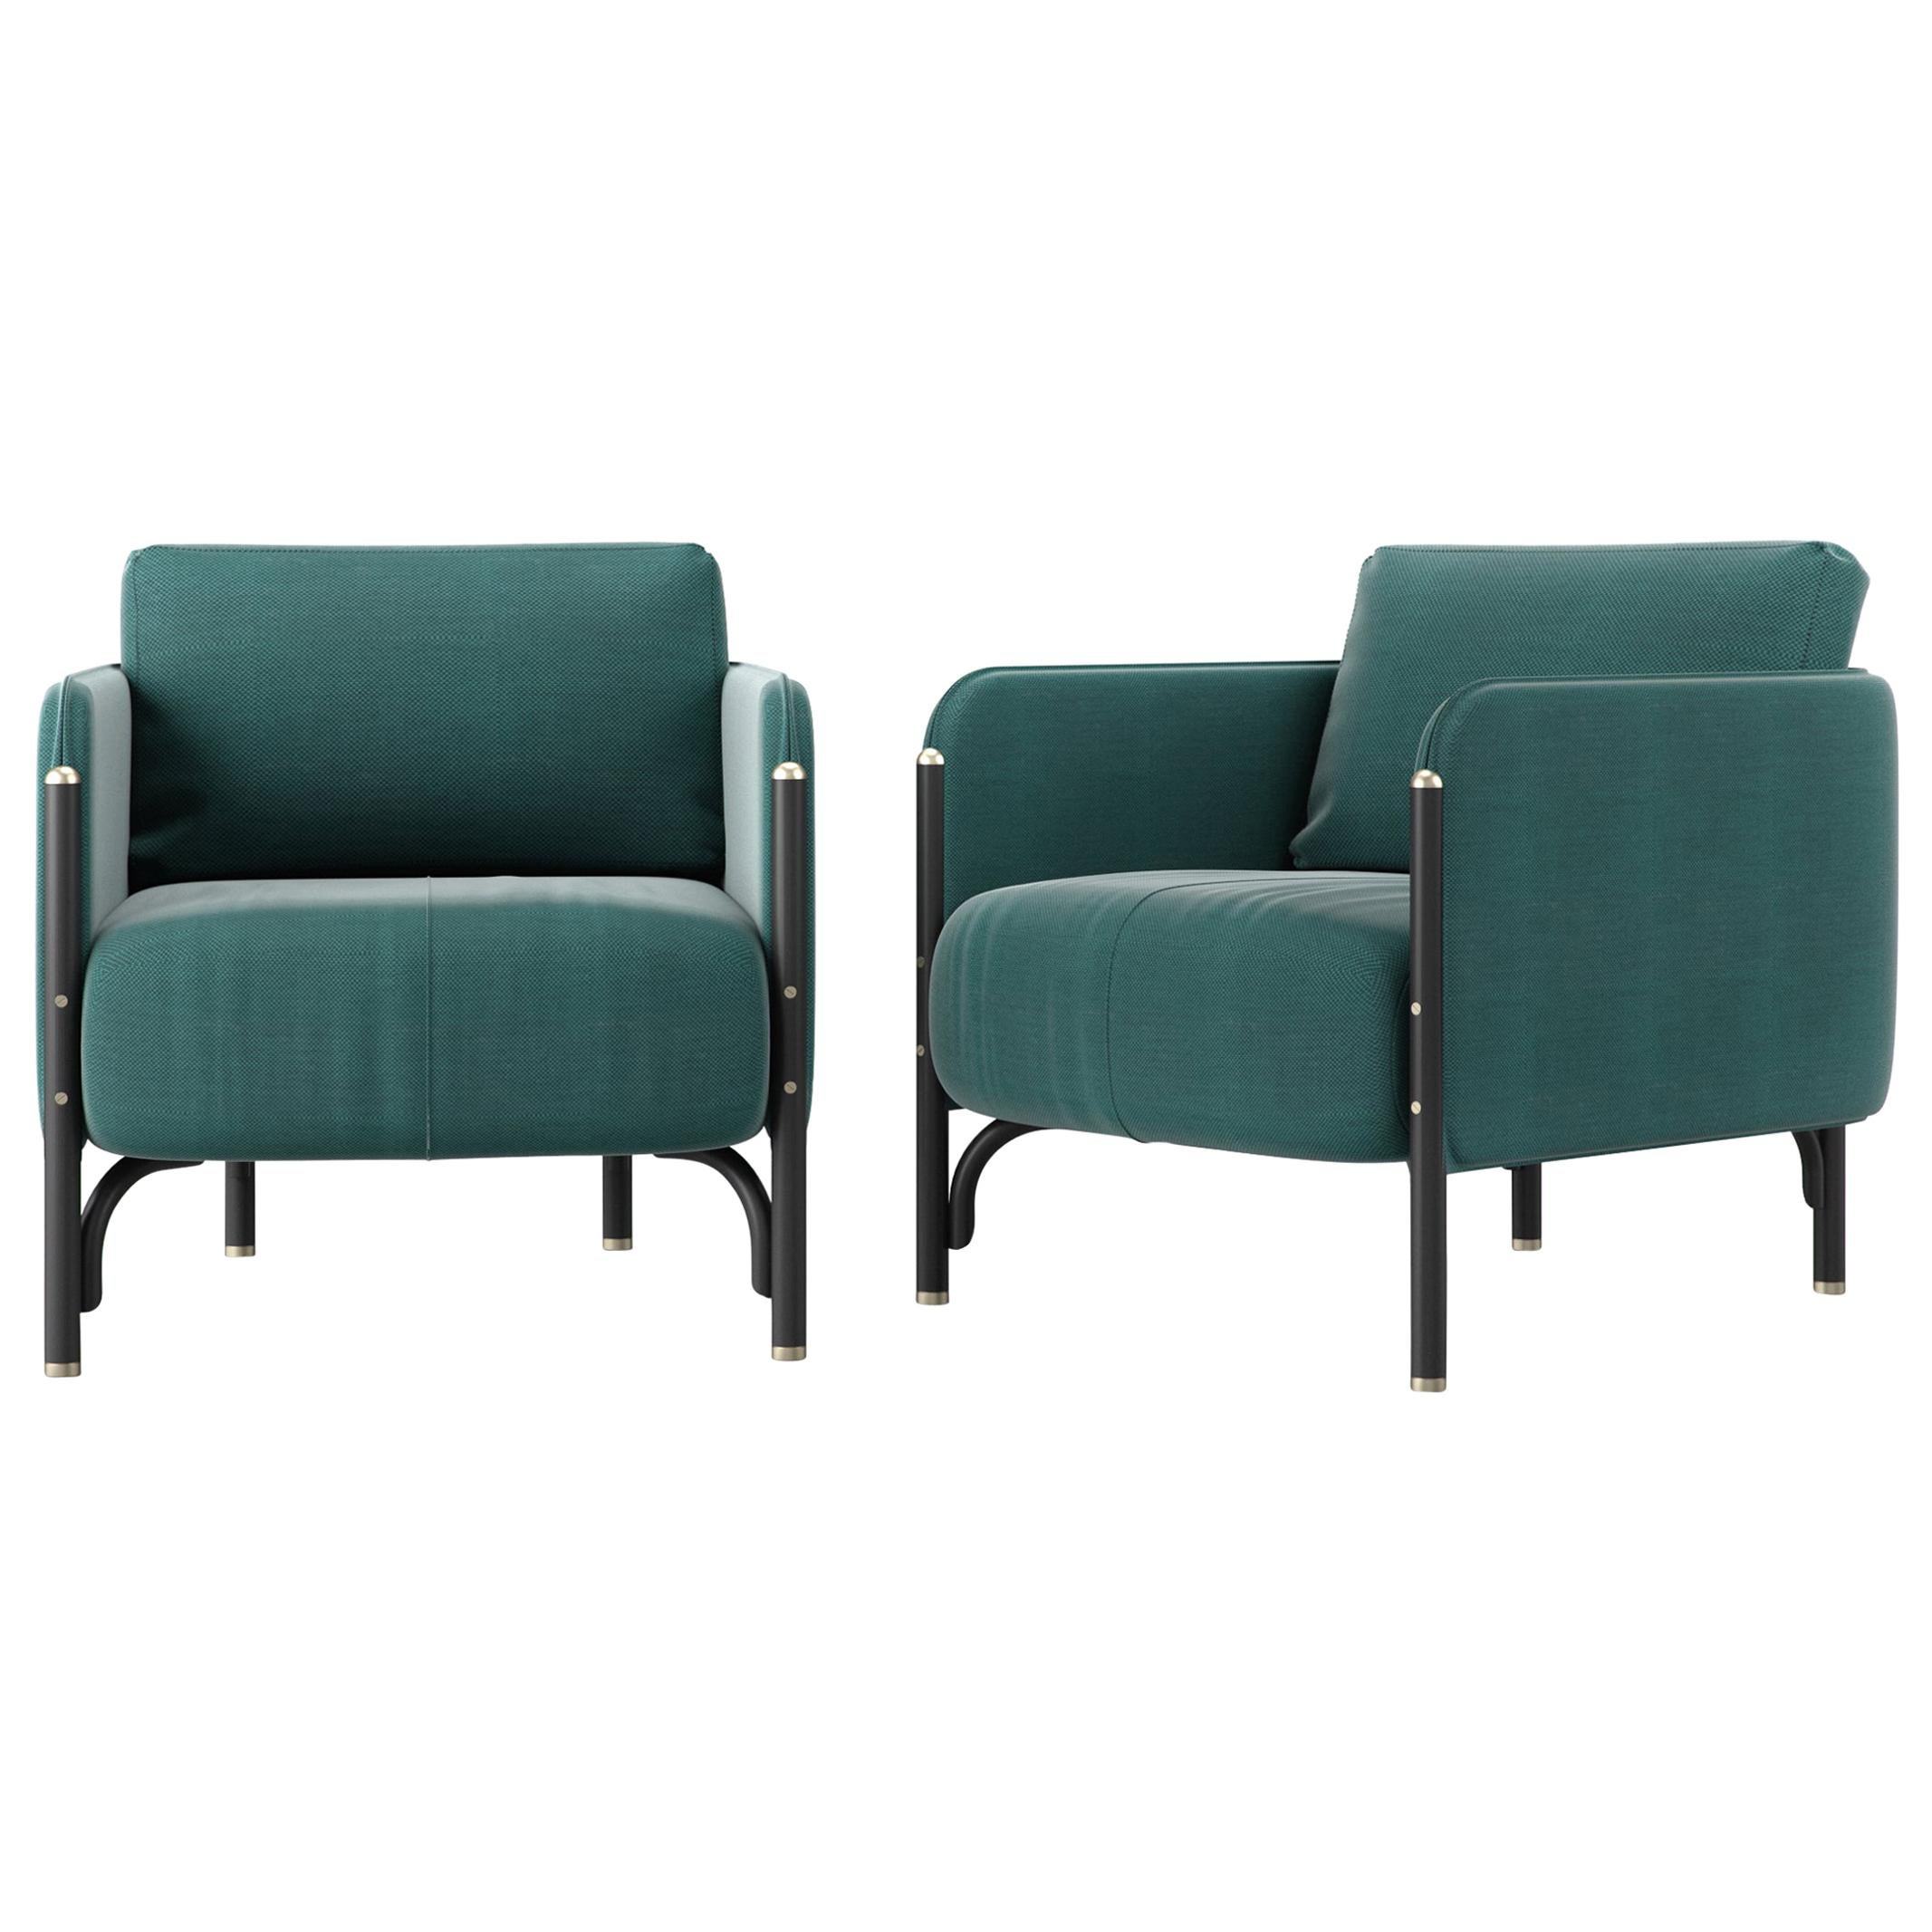 Gebrüder Thonet Vienna GmbH Jannis Lounge Chair in Foam with Green Upholstery